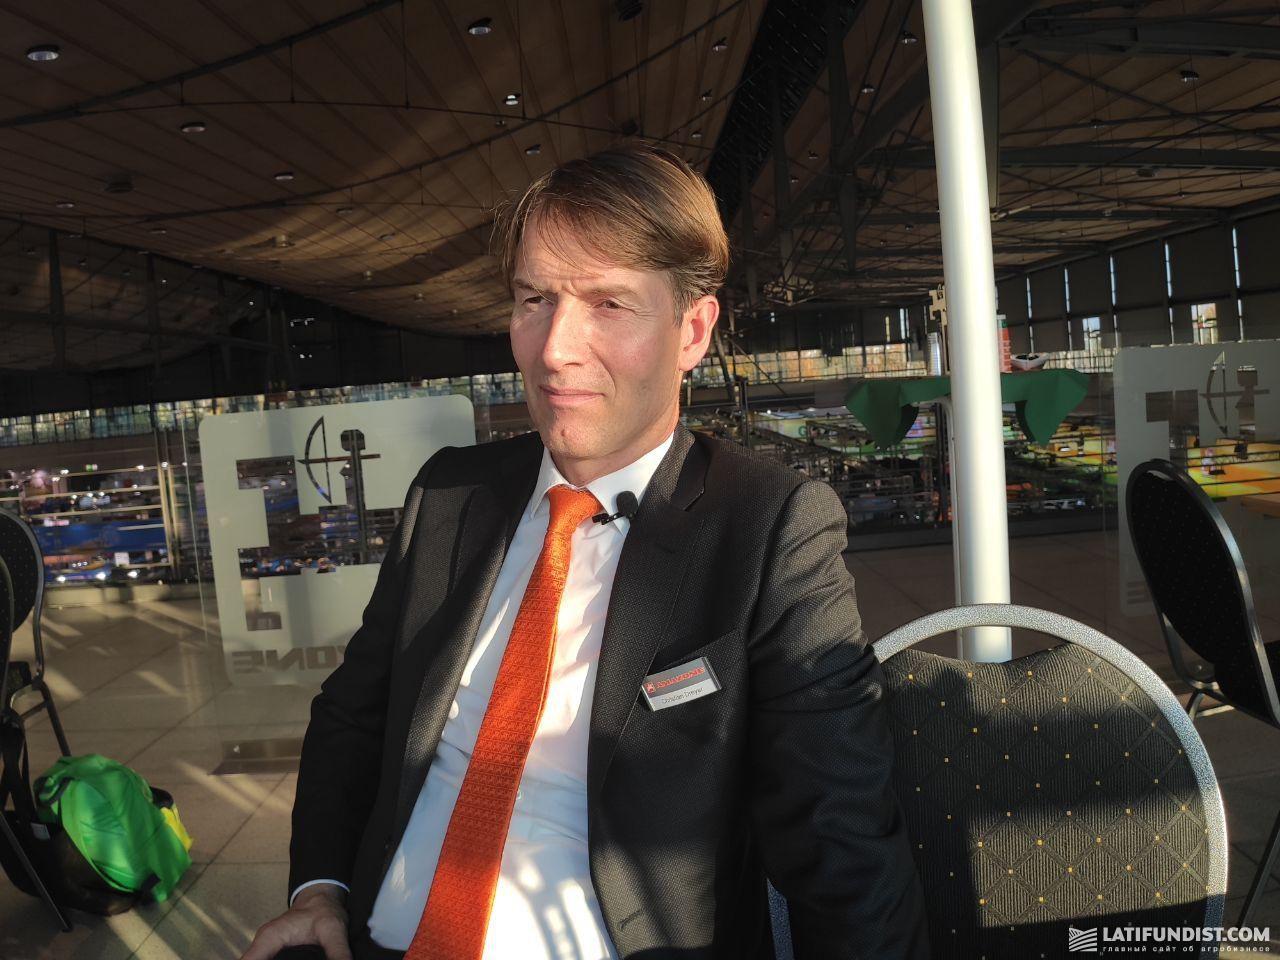 Кристиан Драйер, президент компании Amazone